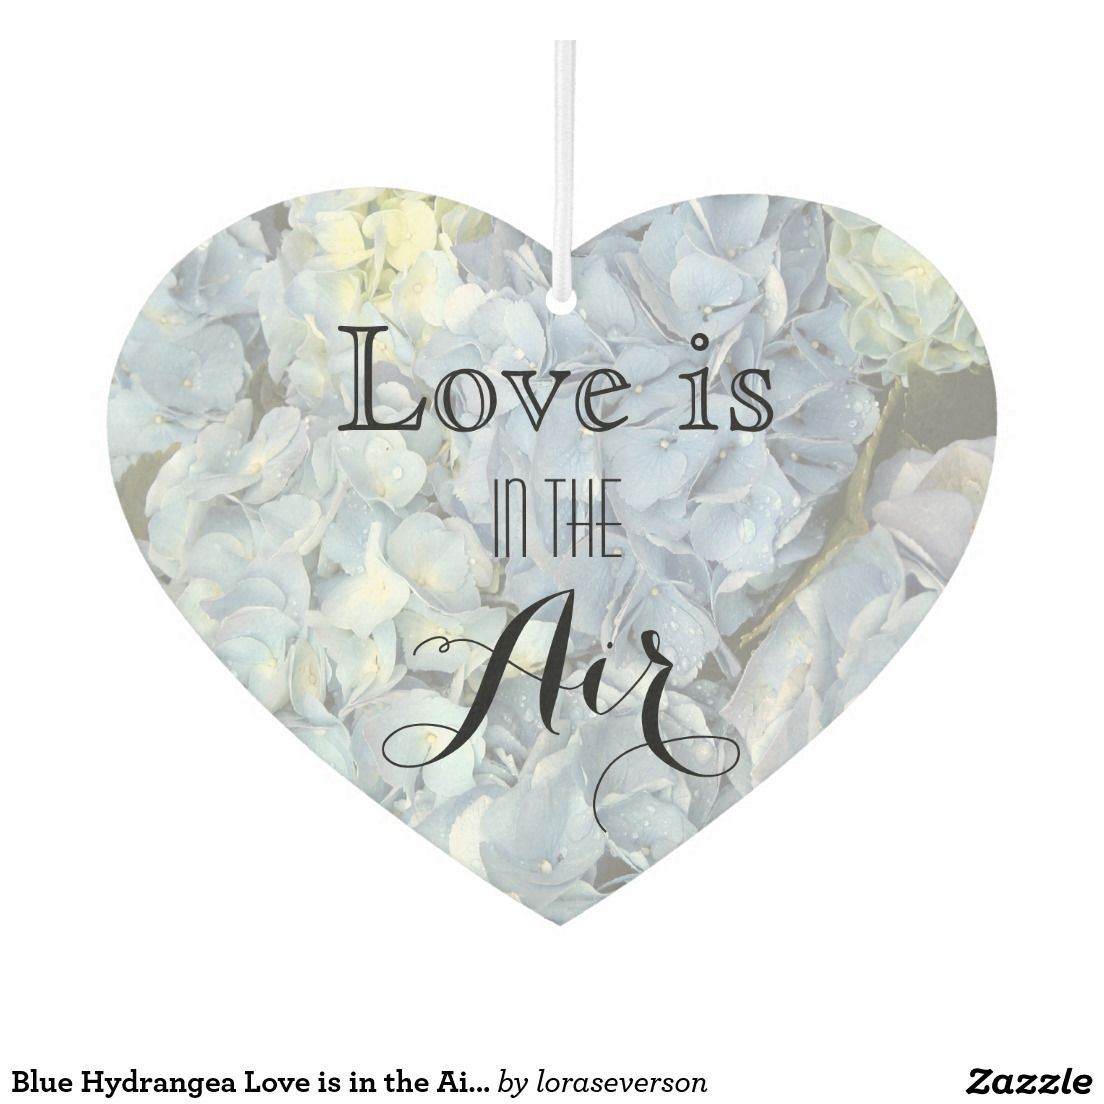 Blue Hydrangea Love is in the Air Wedding Favor Car Air Freshener ...